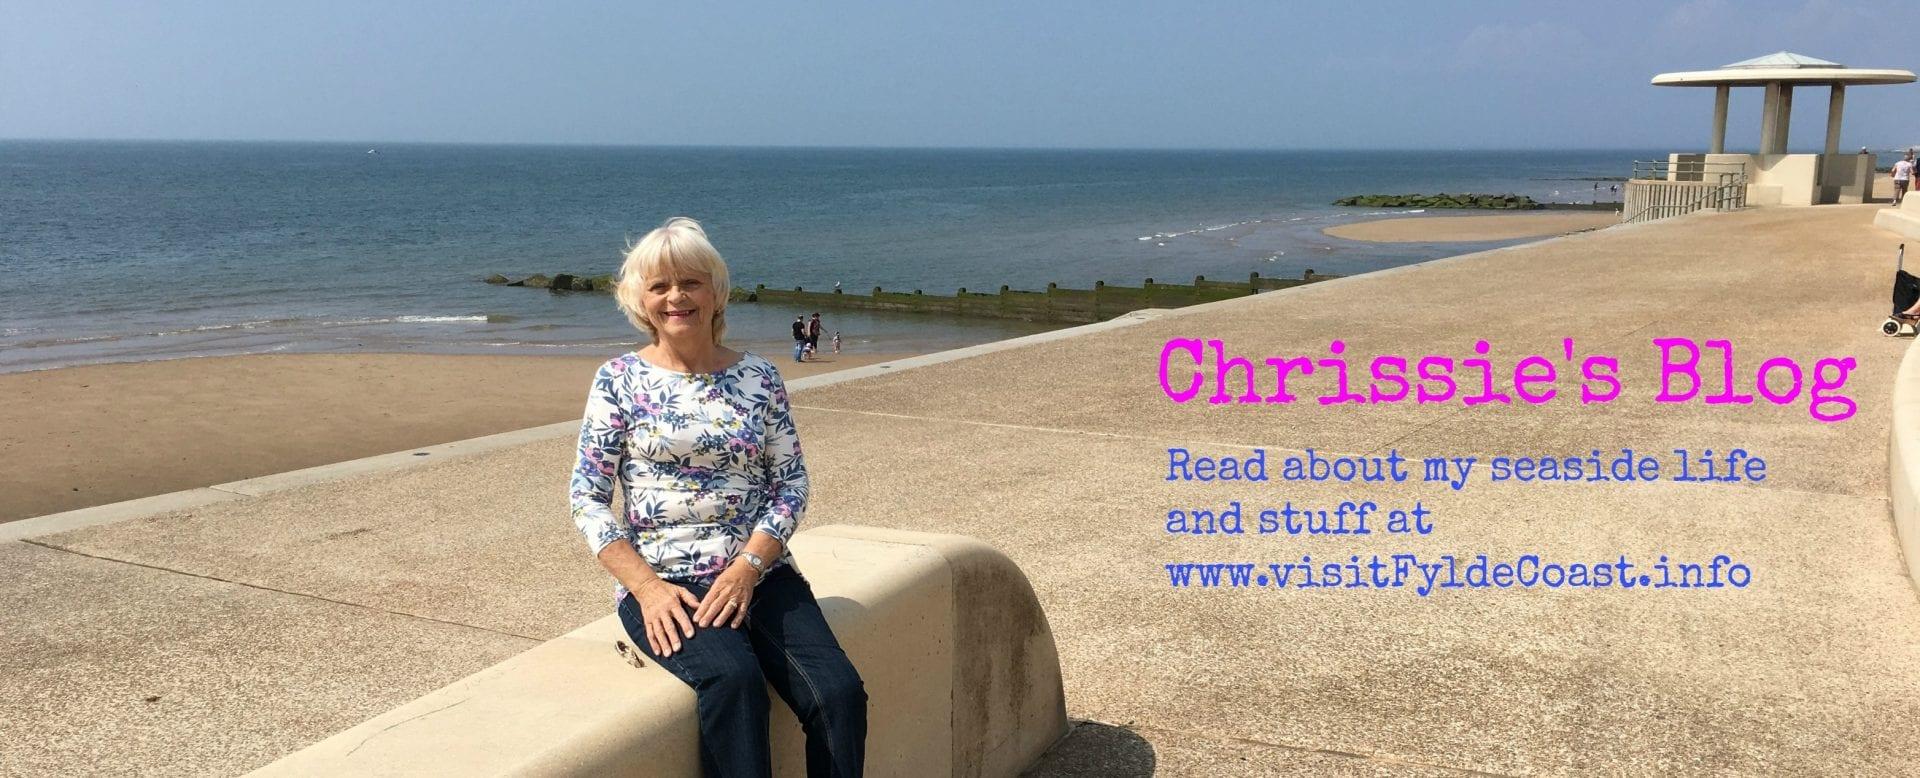 Chrissies Blog